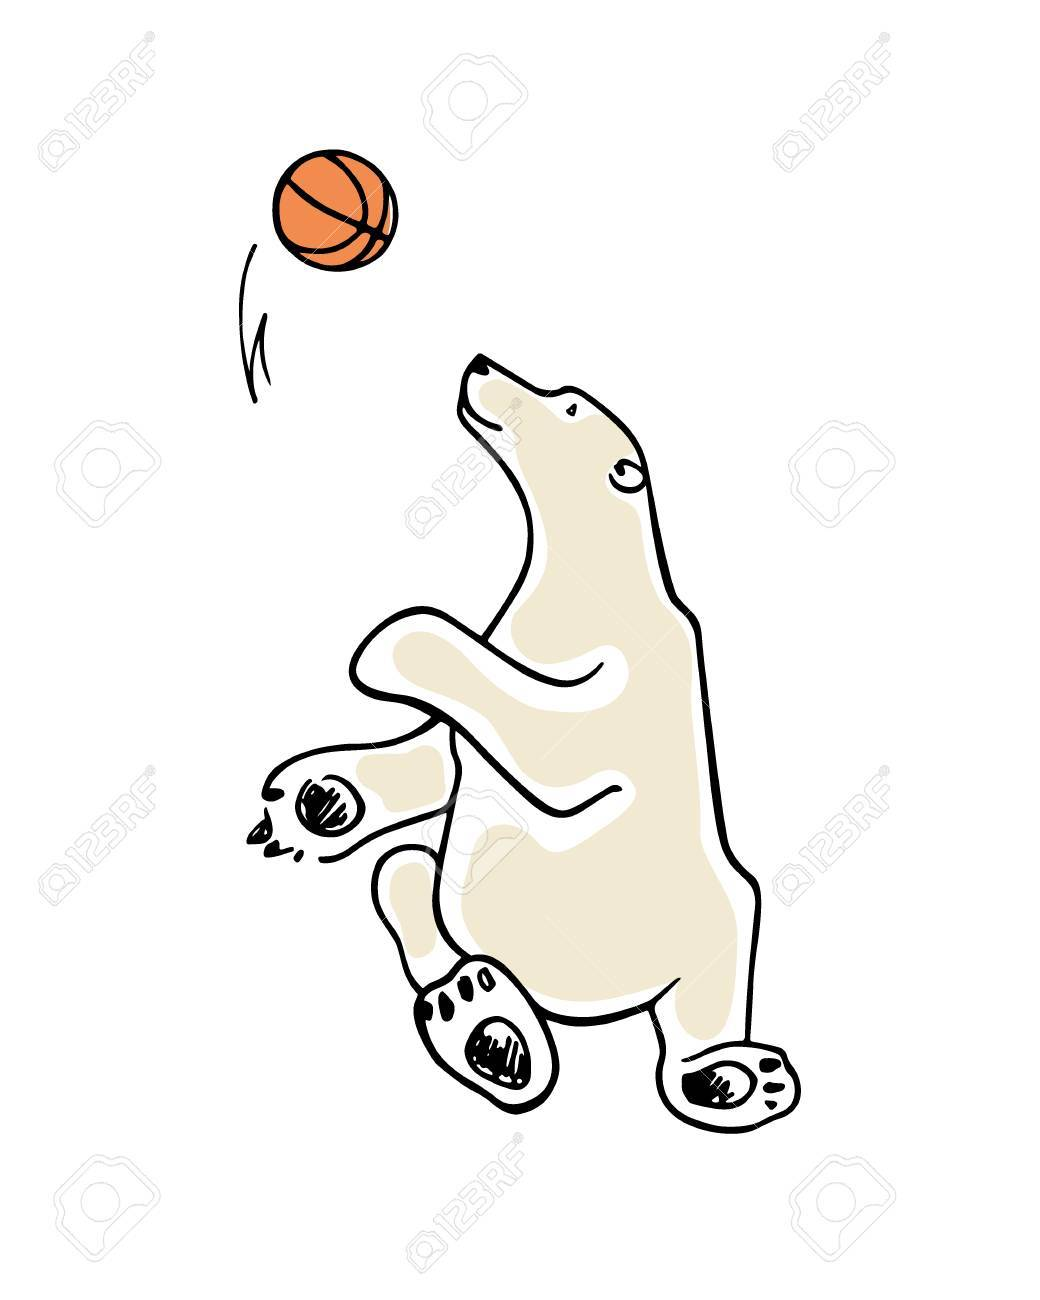 1040x1300 Vector Card With Hand Drawn Cute Polar Bear Playing Basketball